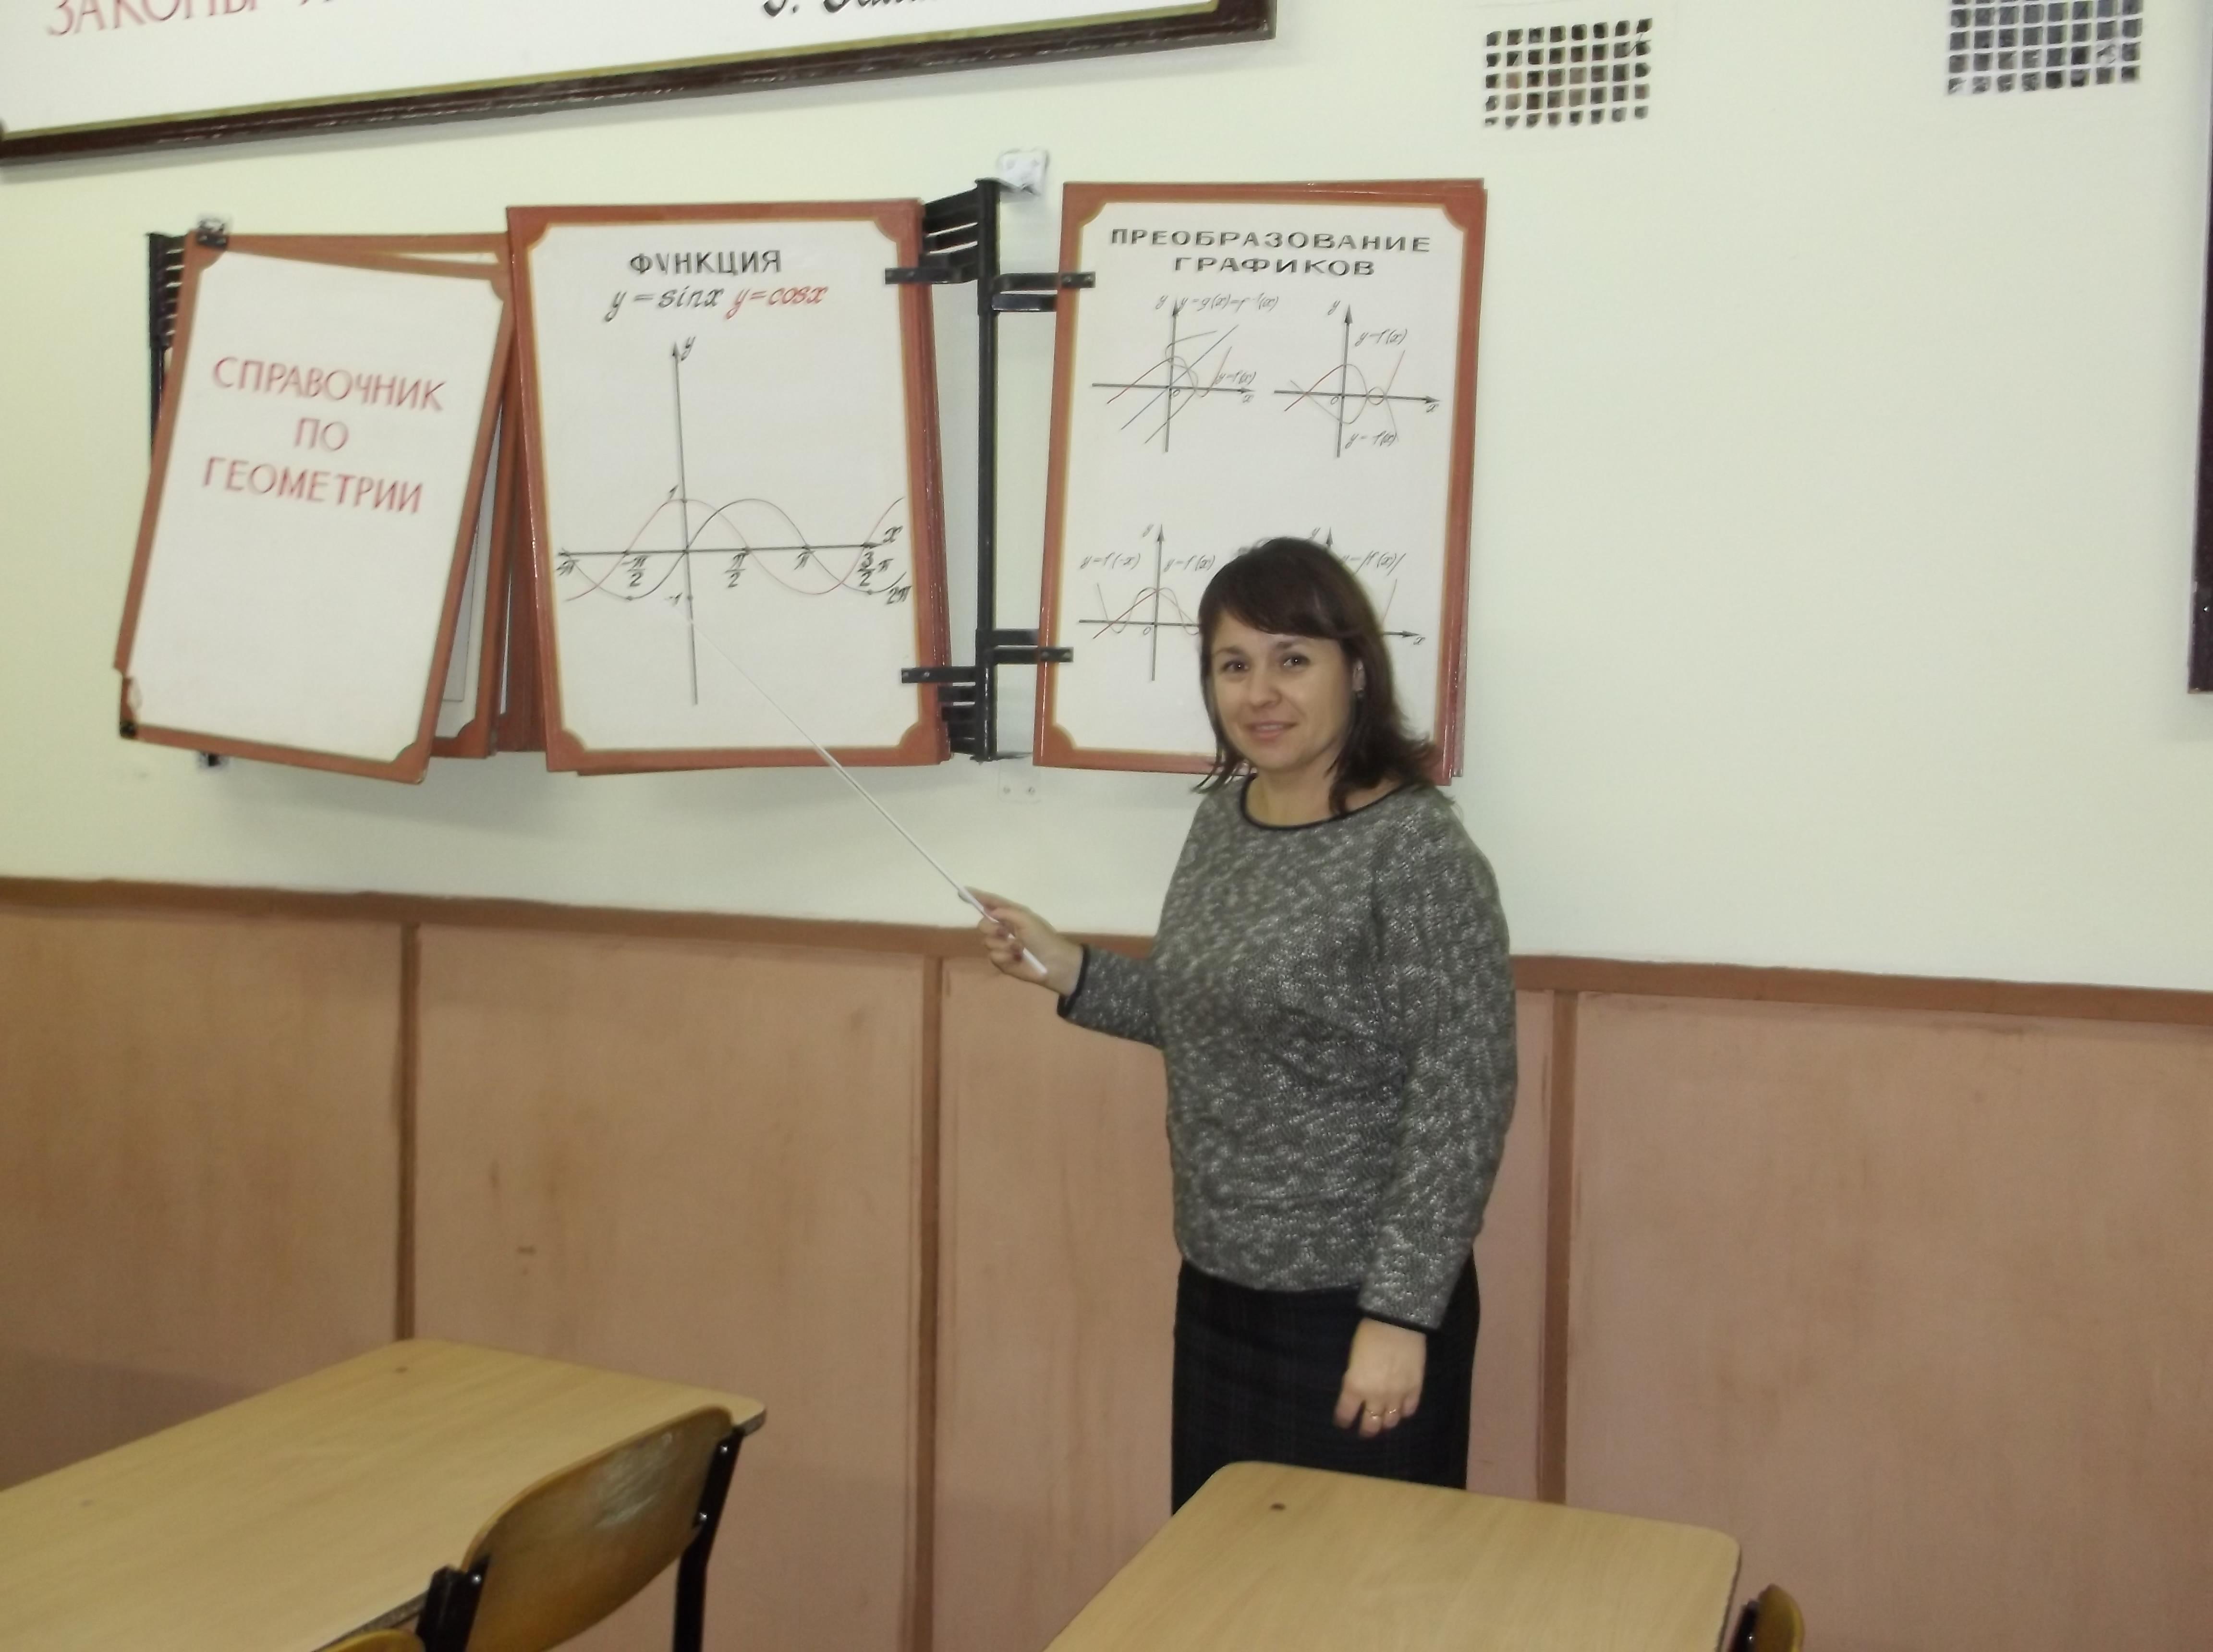 Степанова Т.М